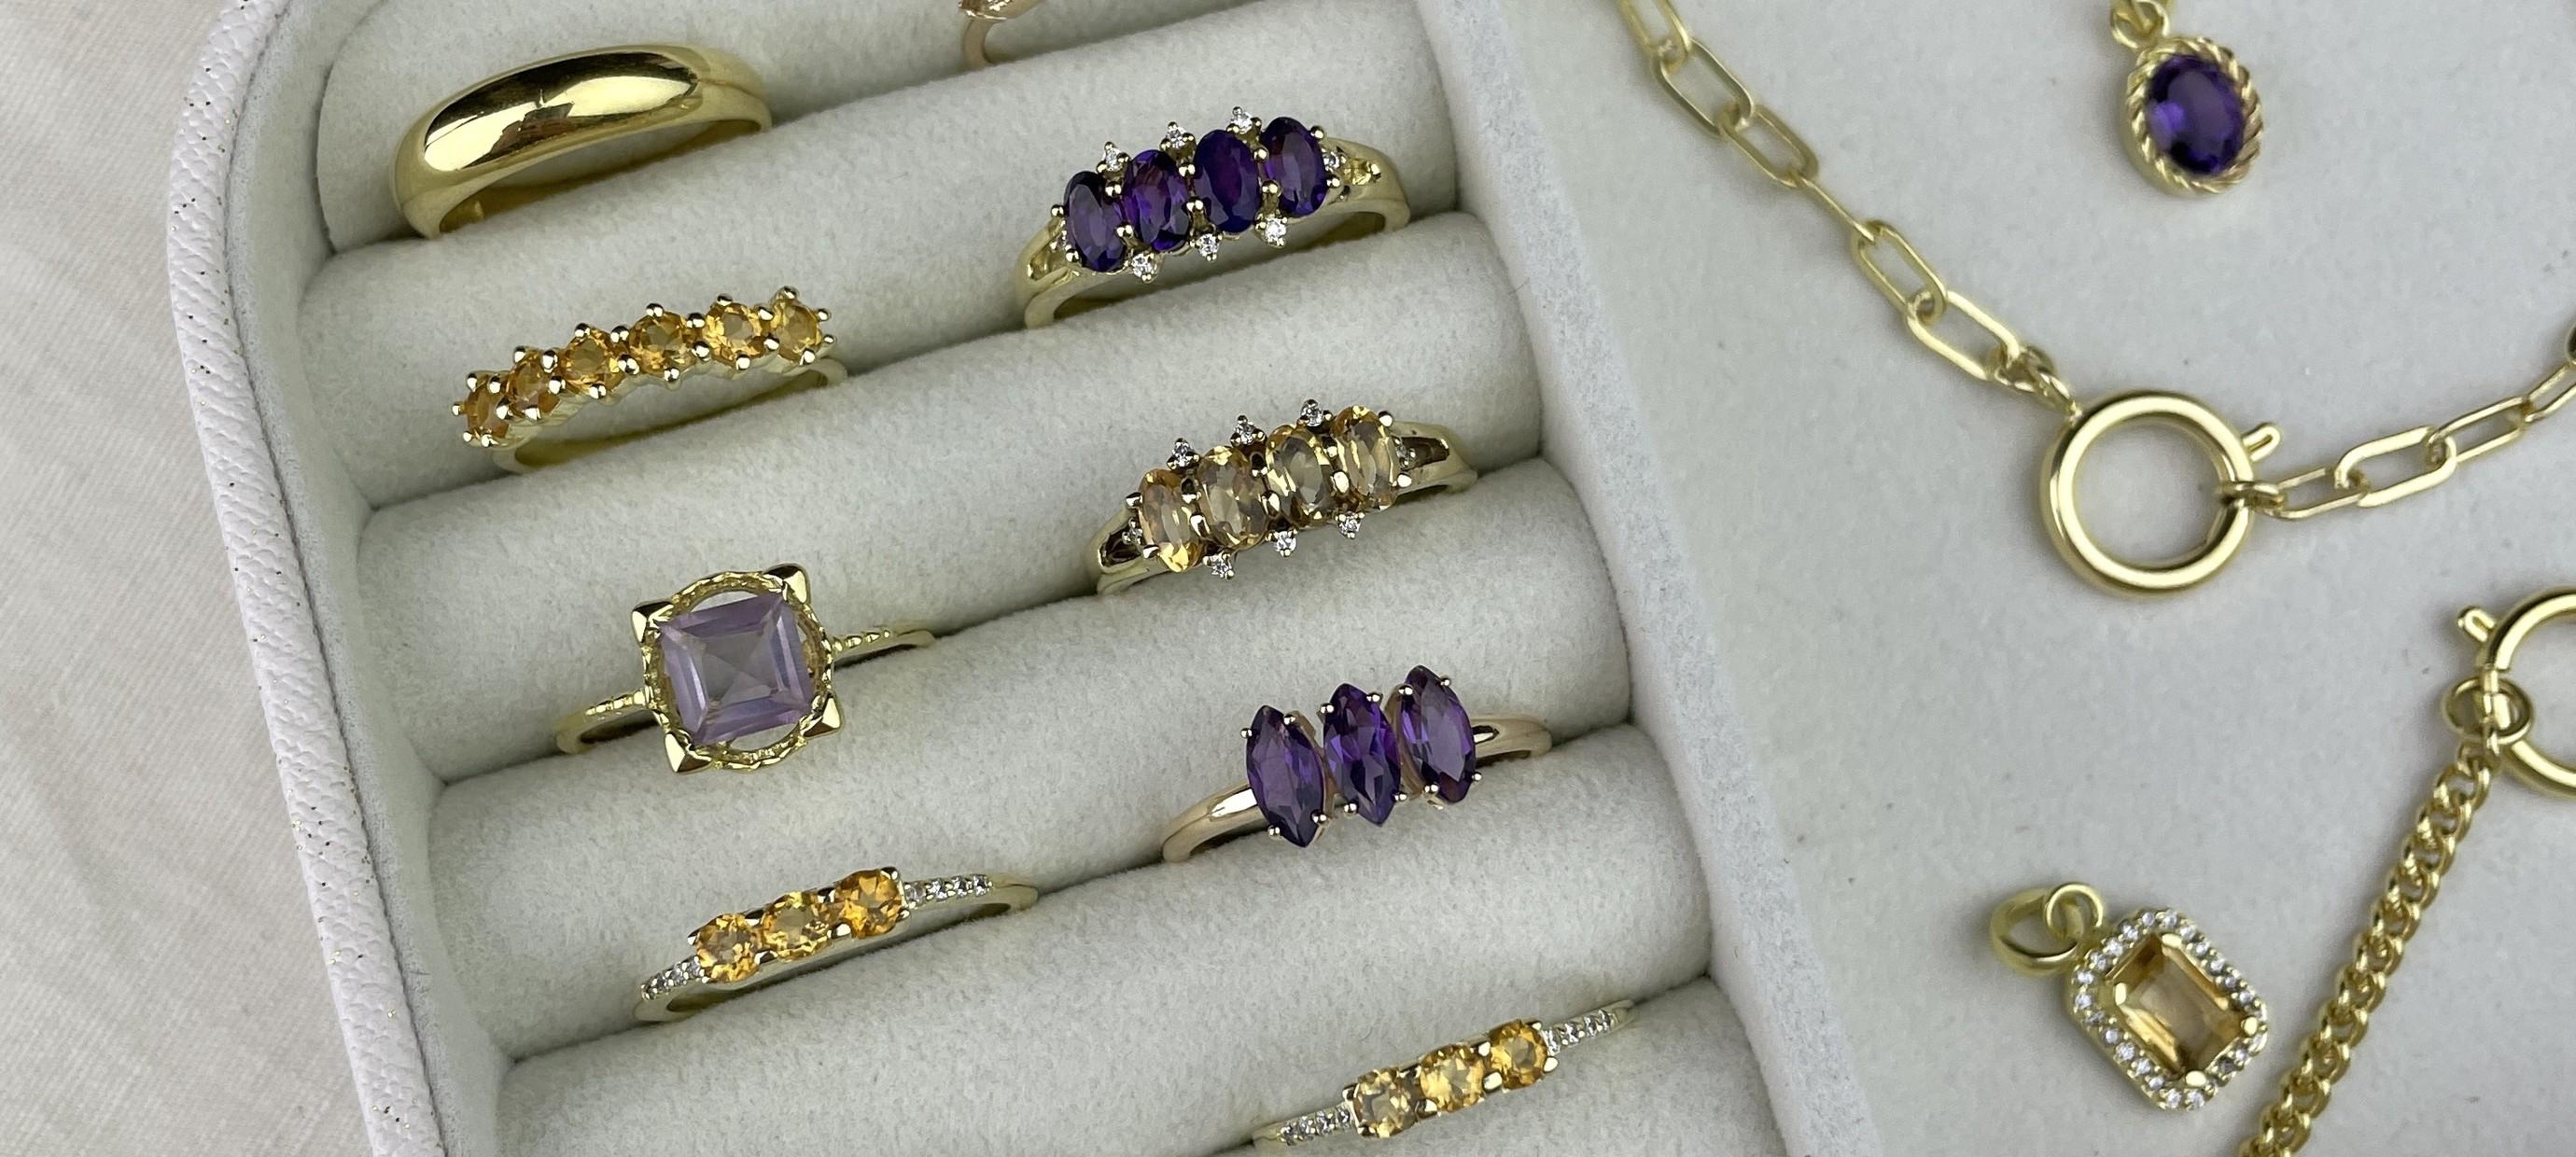 Verkleuren gold plated sieraden?